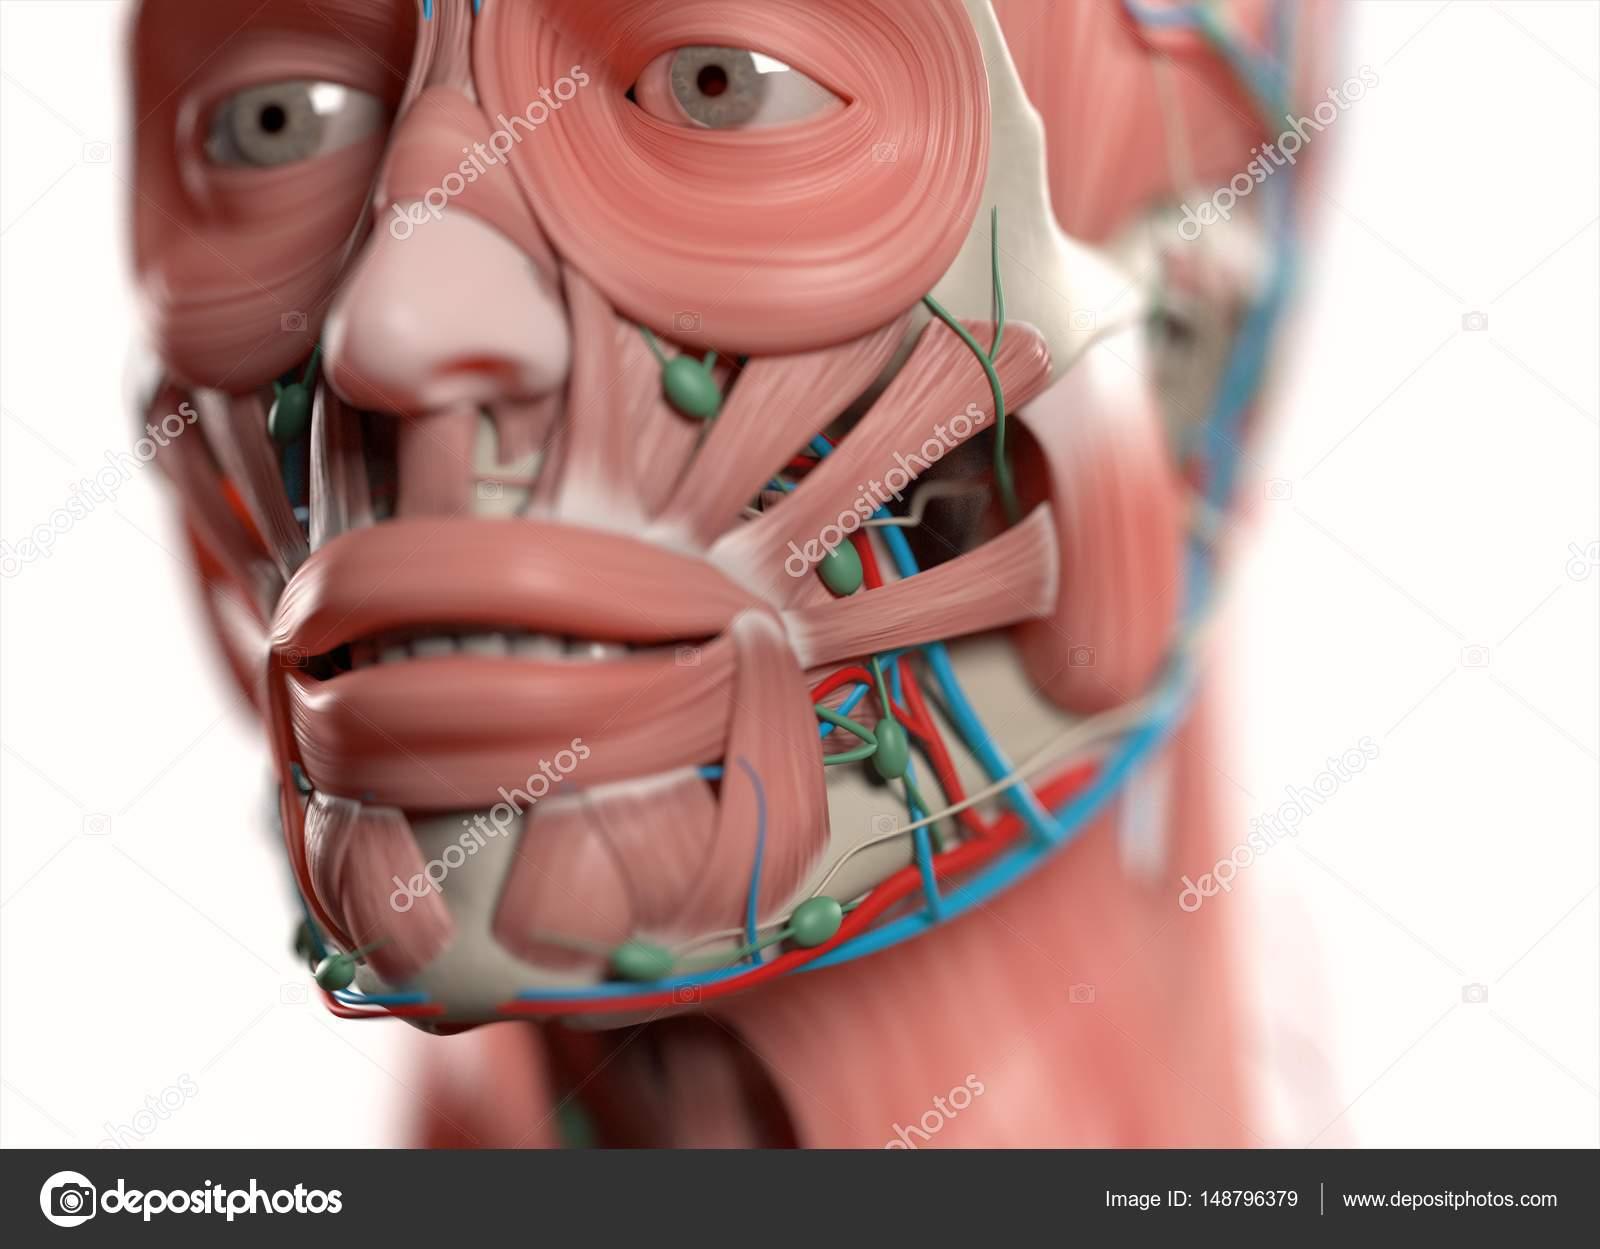 Human Face Anatomy Model Stock Photo Anatomyinsider 148796379